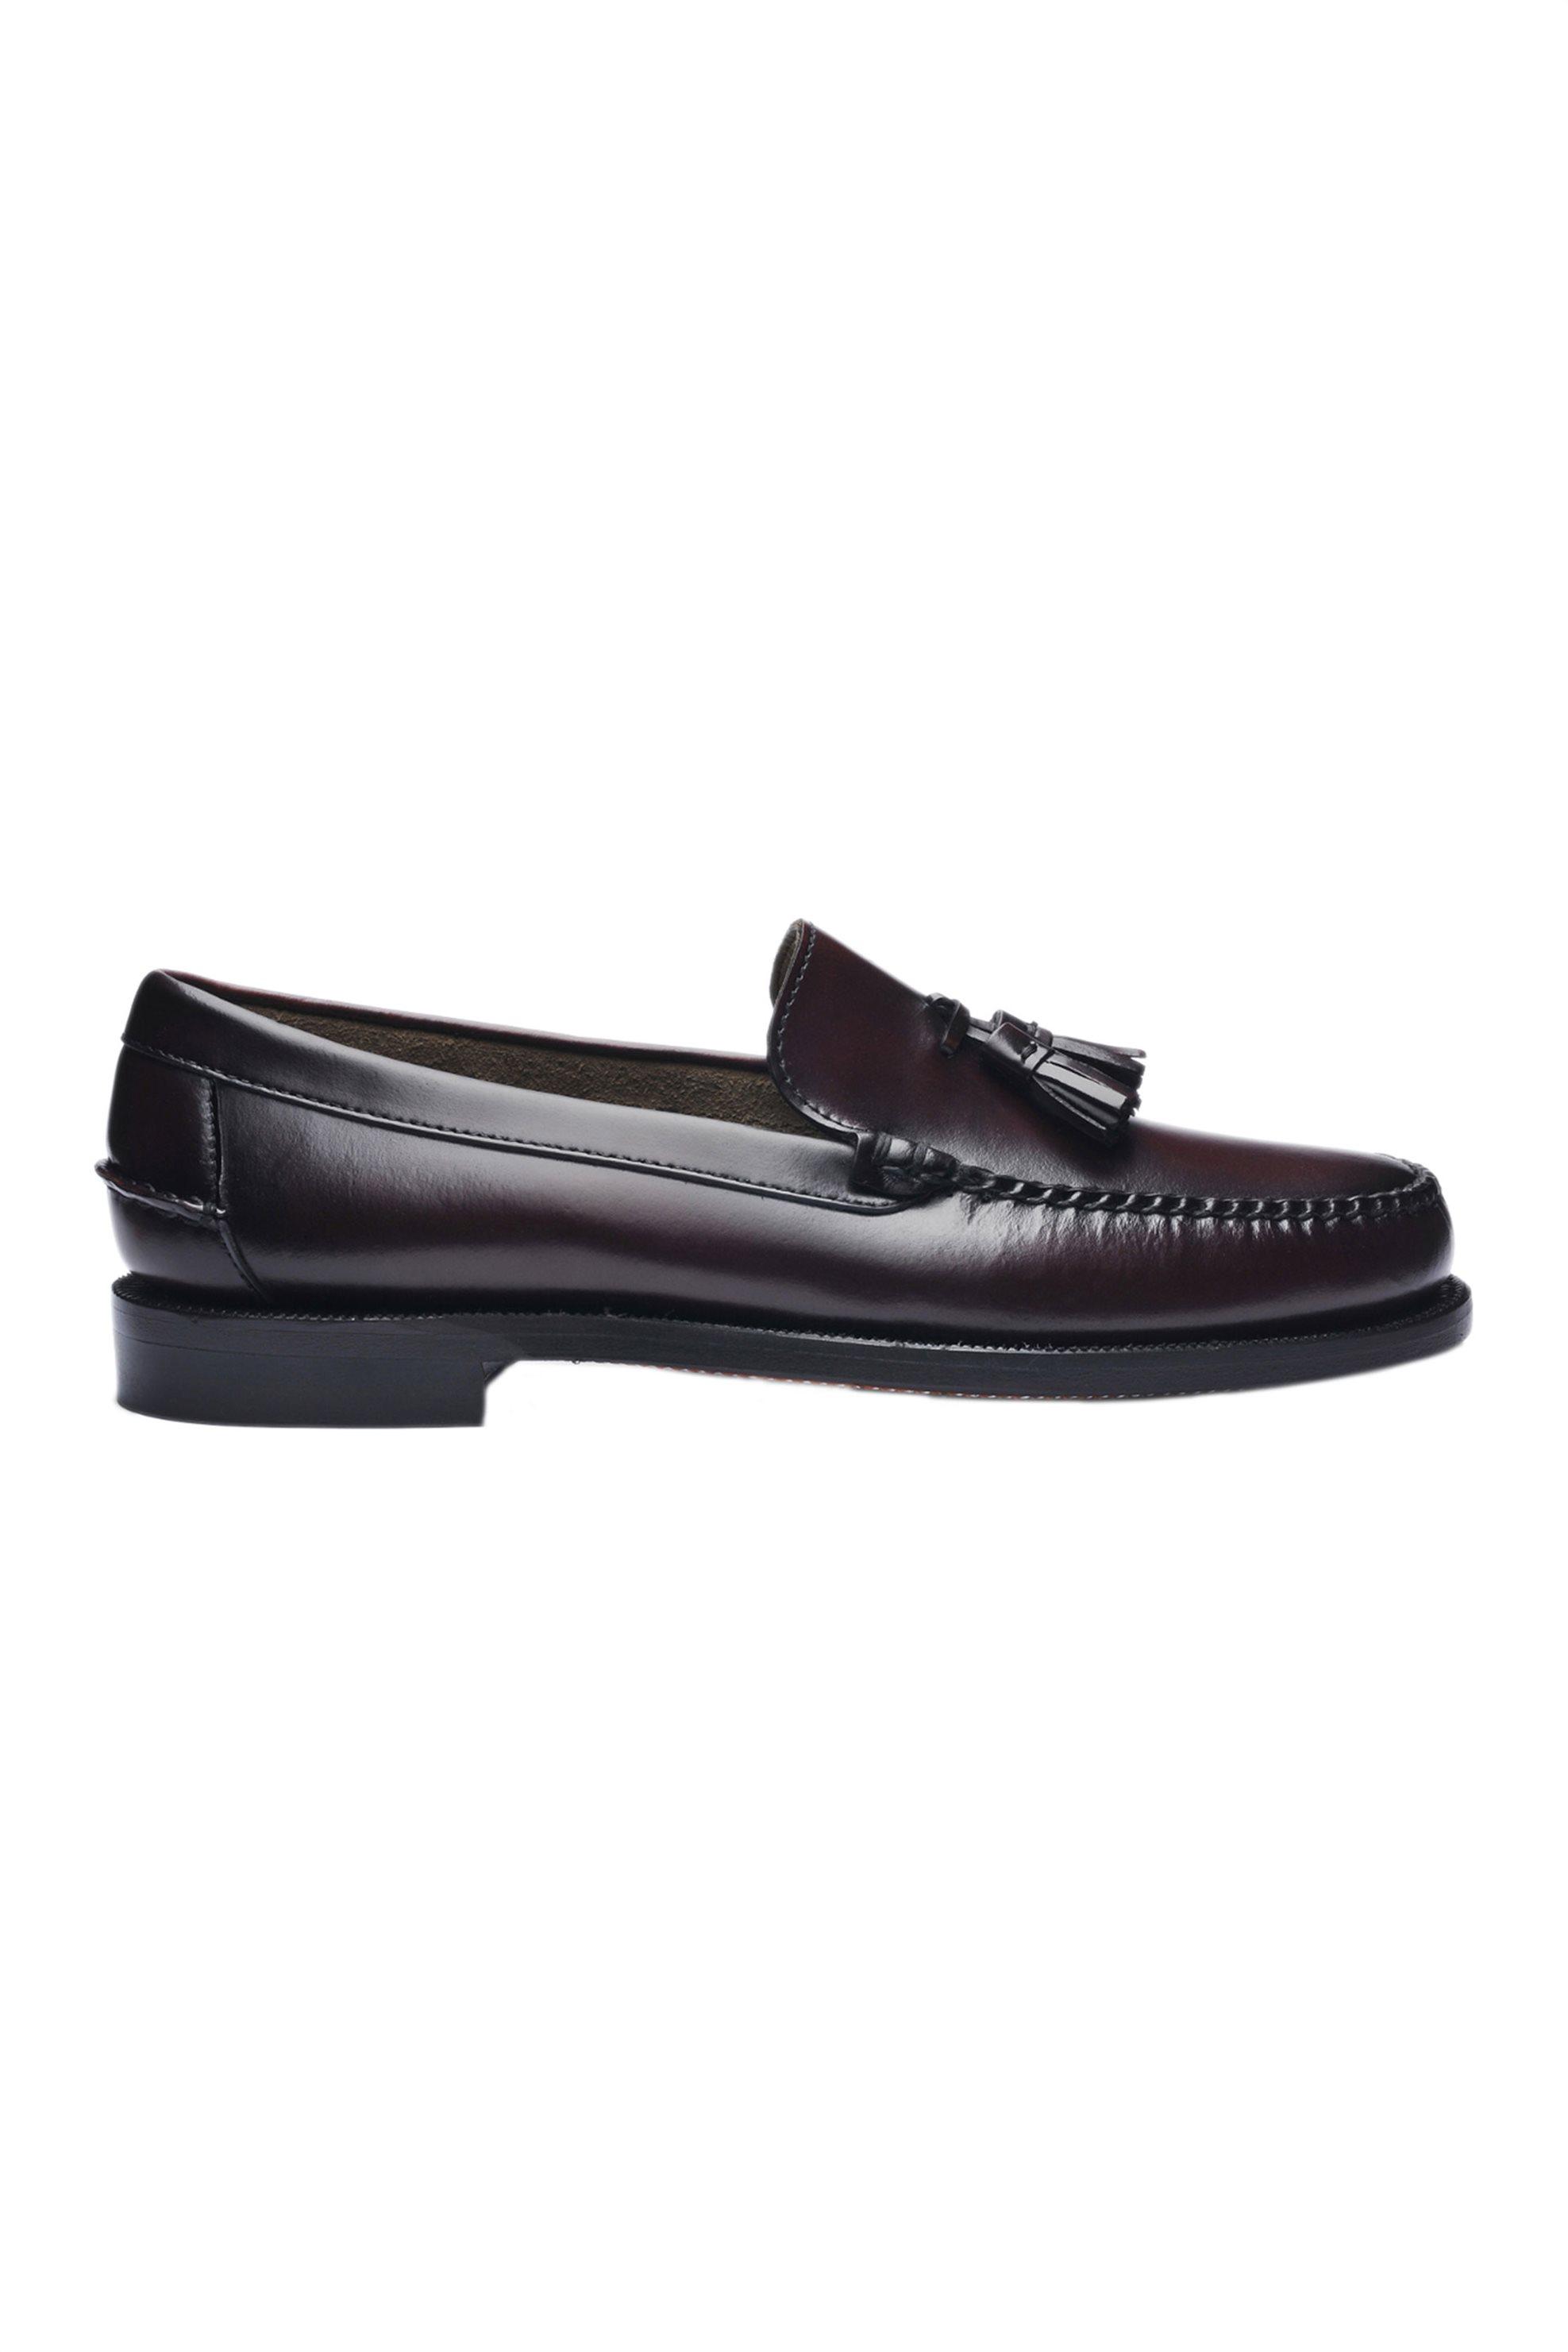 "Sebago® ανδρικά loafers με φουντάκια ""Classic Will"" – L7001R20-903W – Μπορντό"